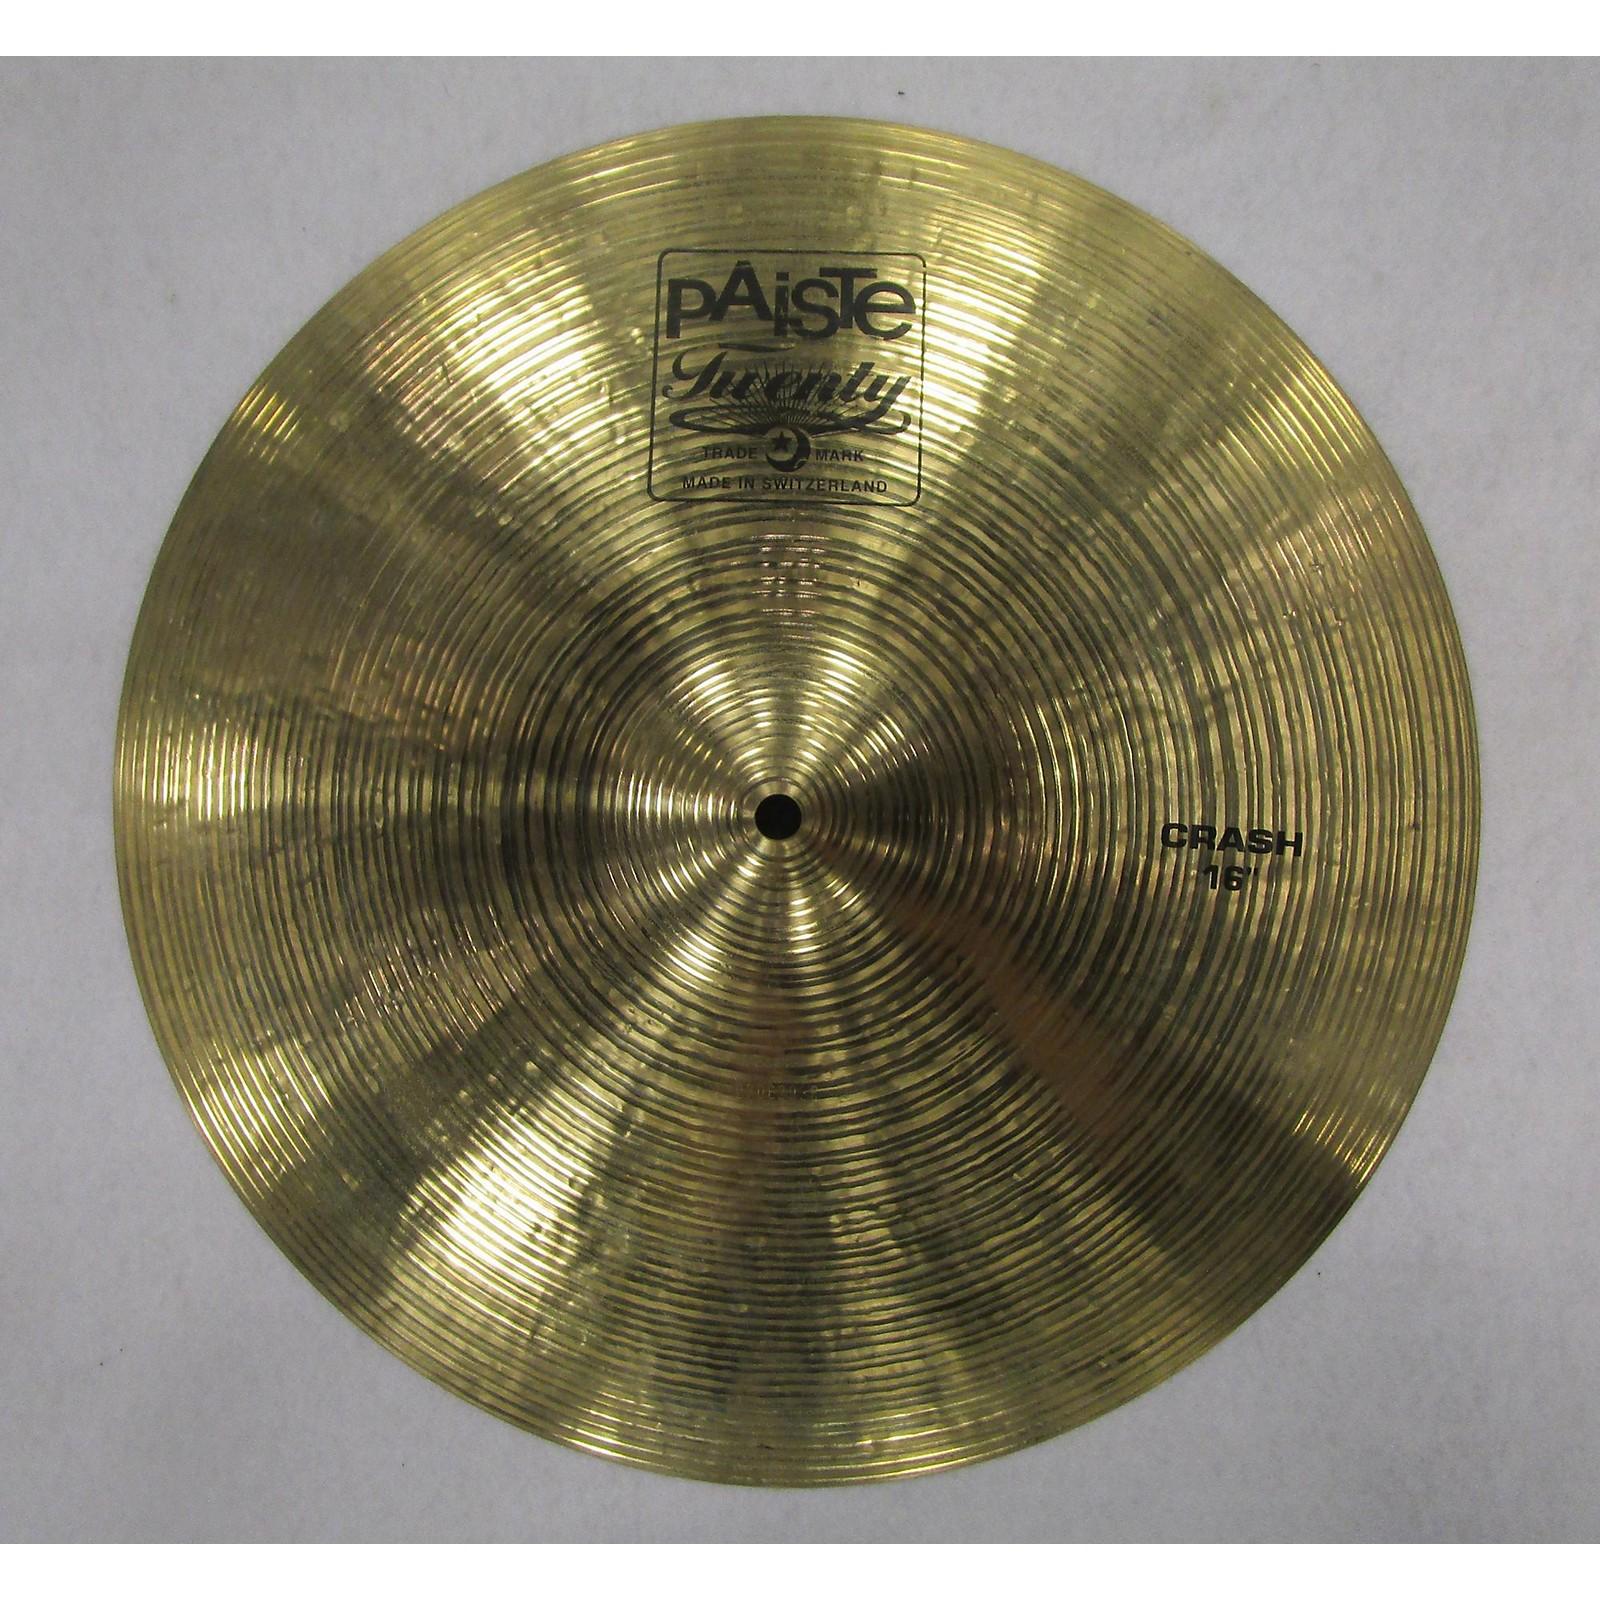 Paiste 16in Twenty Series Crash Cymbal